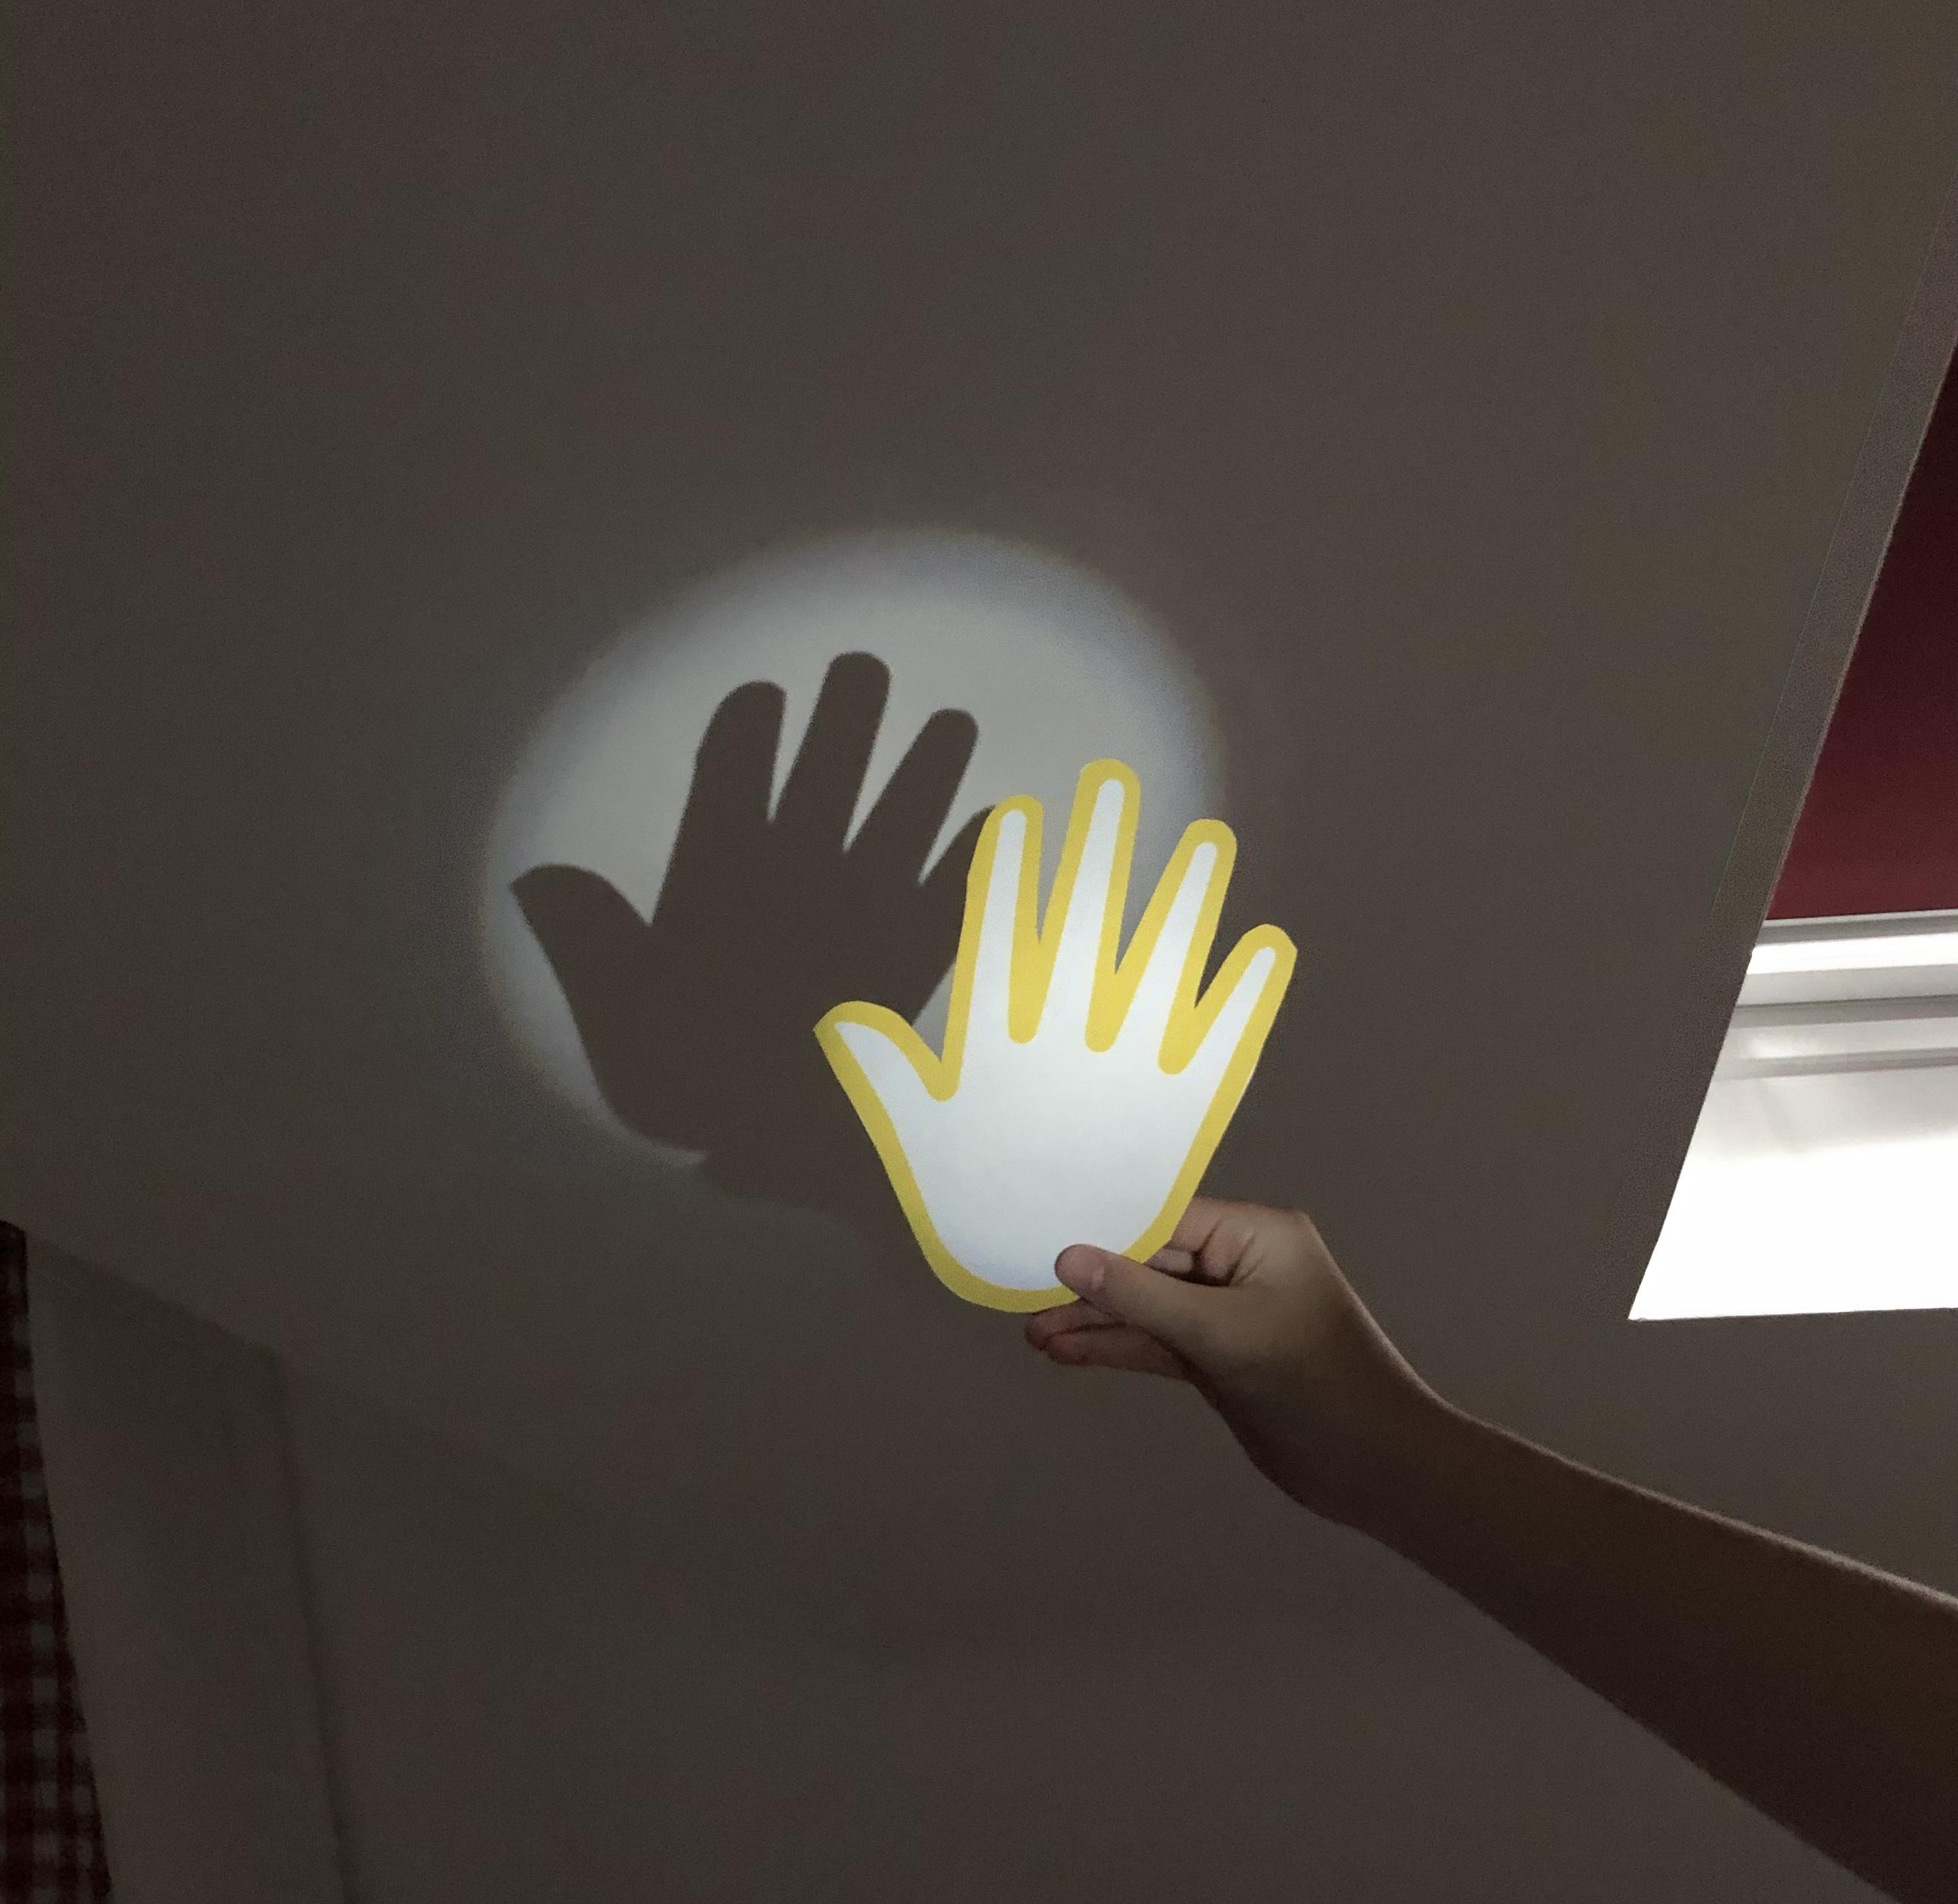 shadow hand puppet